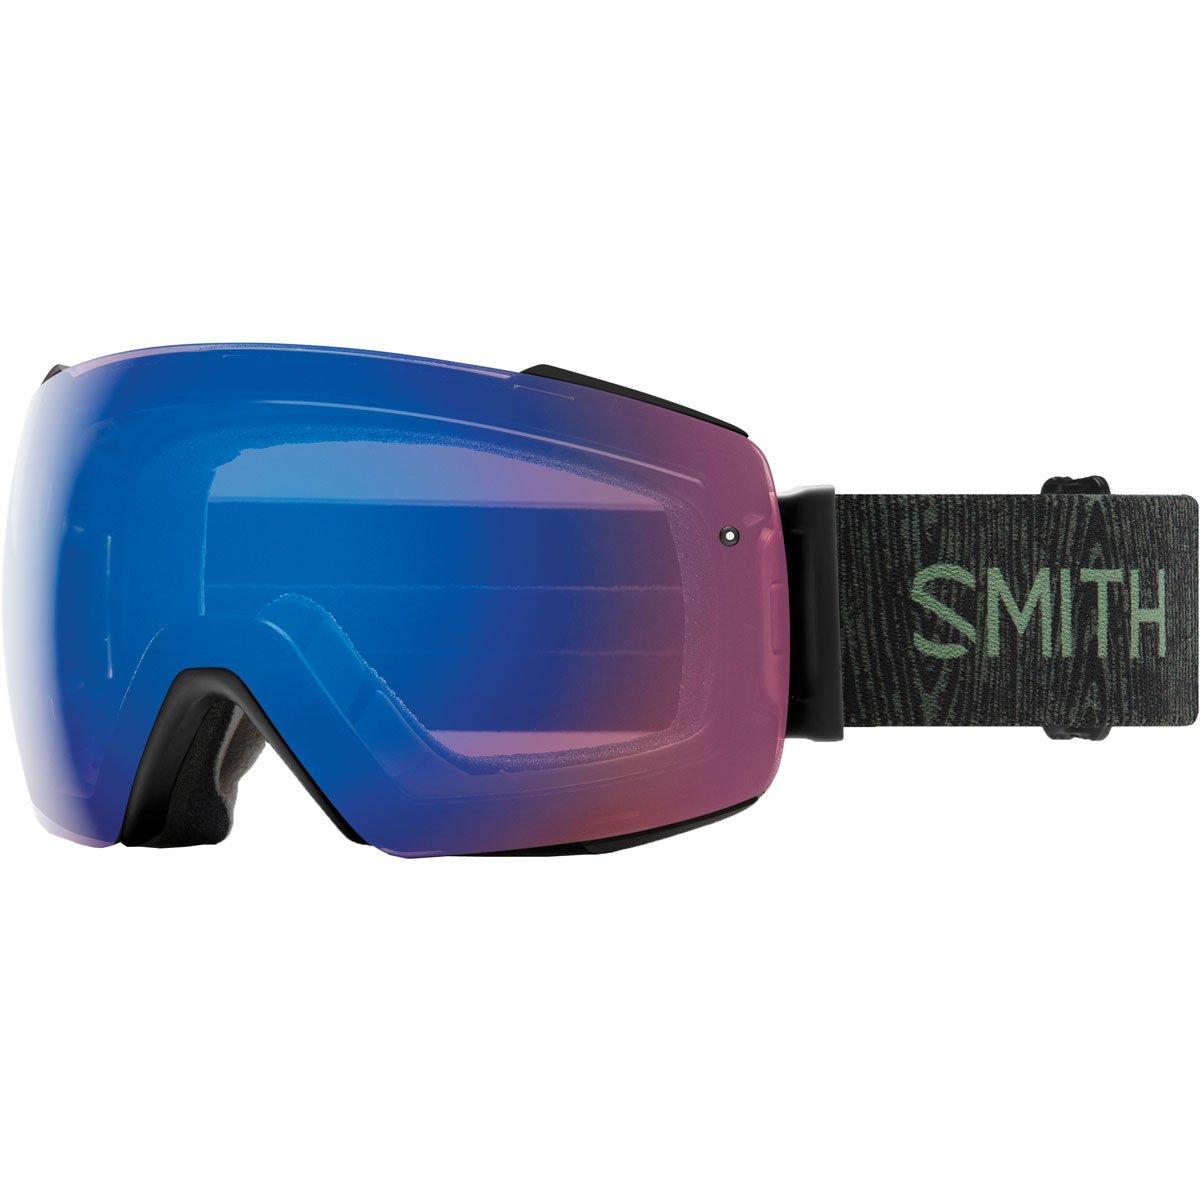 Smith Optics Io Mag - Ac Adult Snow Goggles - Ac - Jake Blauvelt/Chromapop Storm Rose Flash